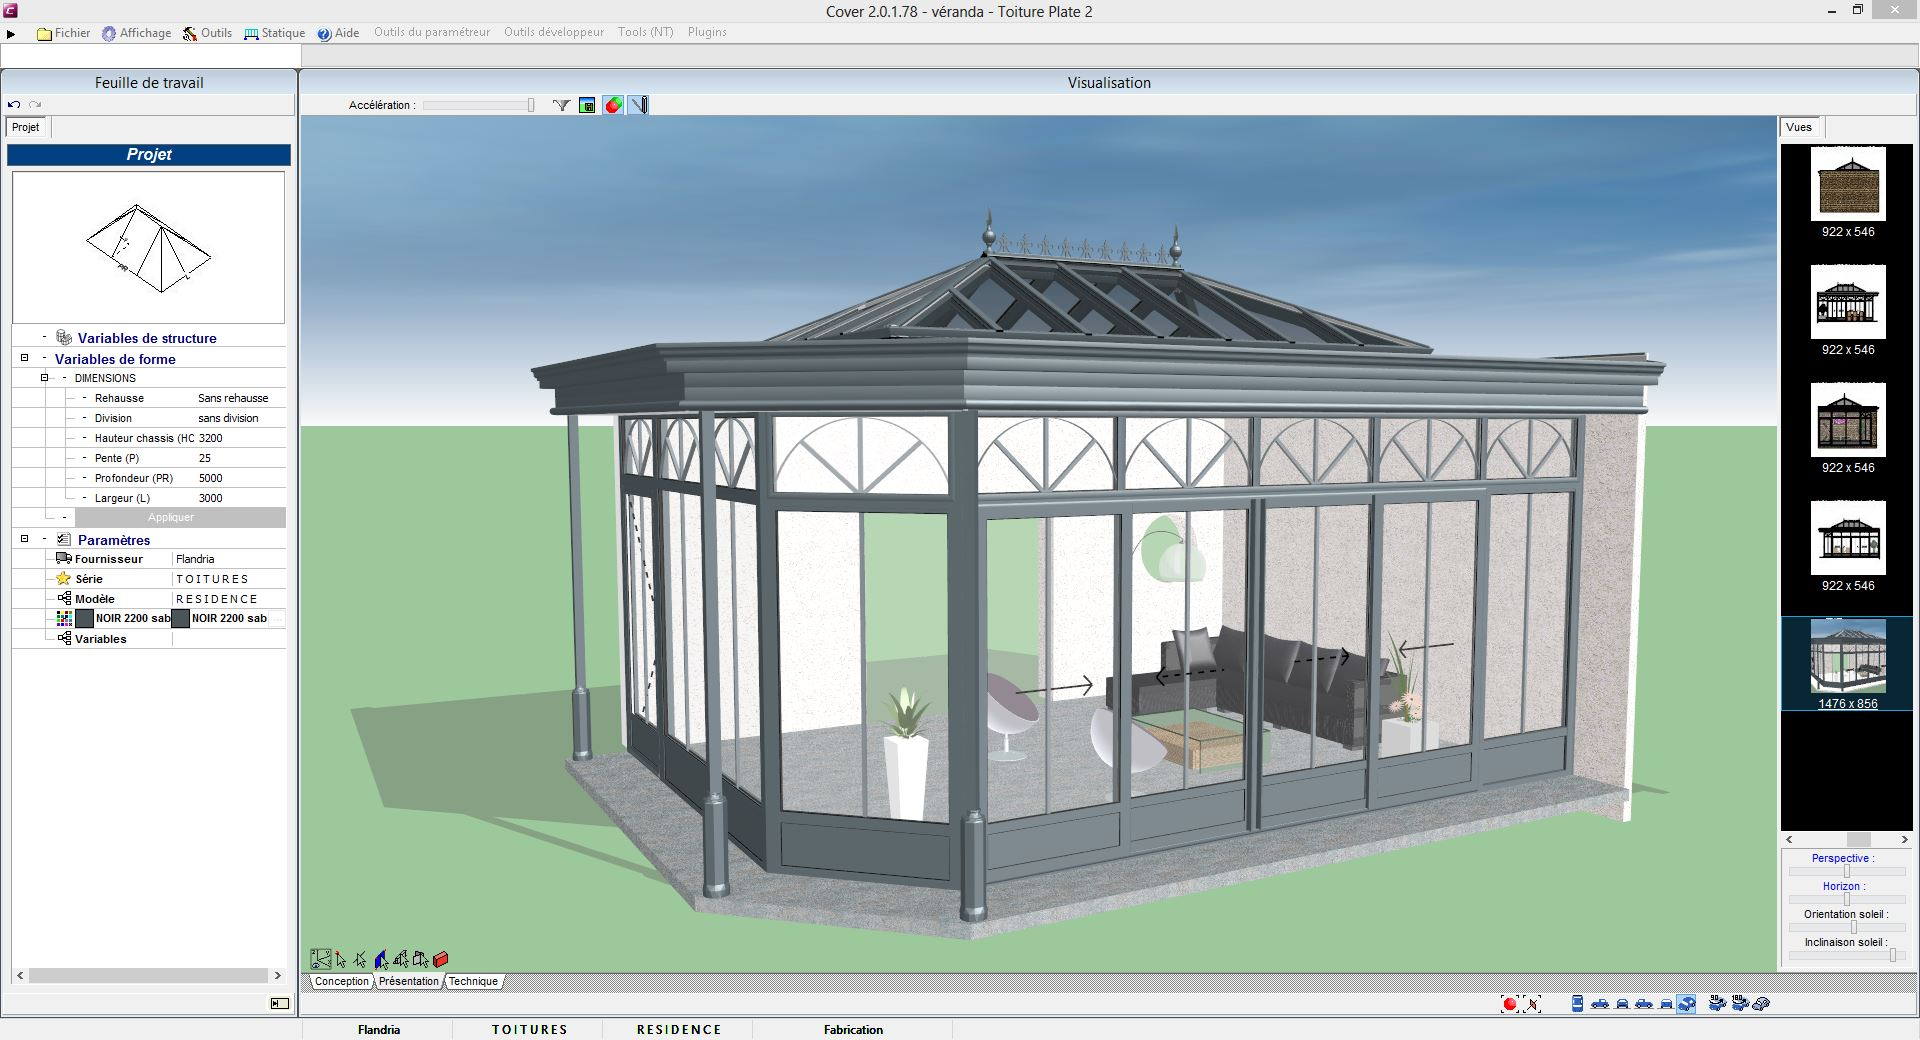 verandas cover. Black Bedroom Furniture Sets. Home Design Ideas